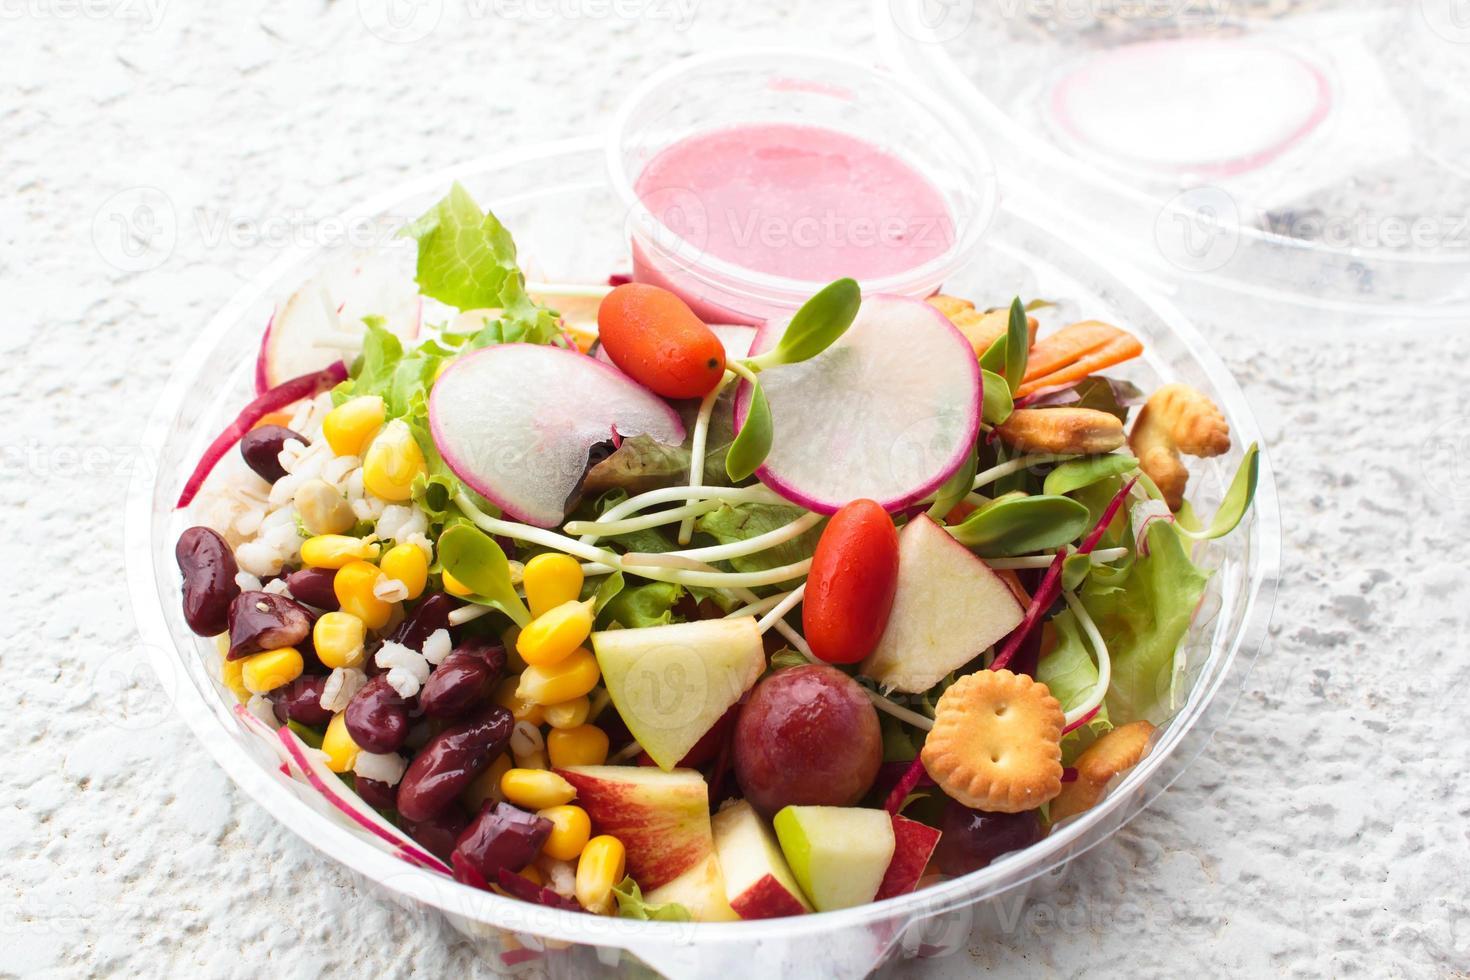 Fresh salad vegetable and fruit. photo